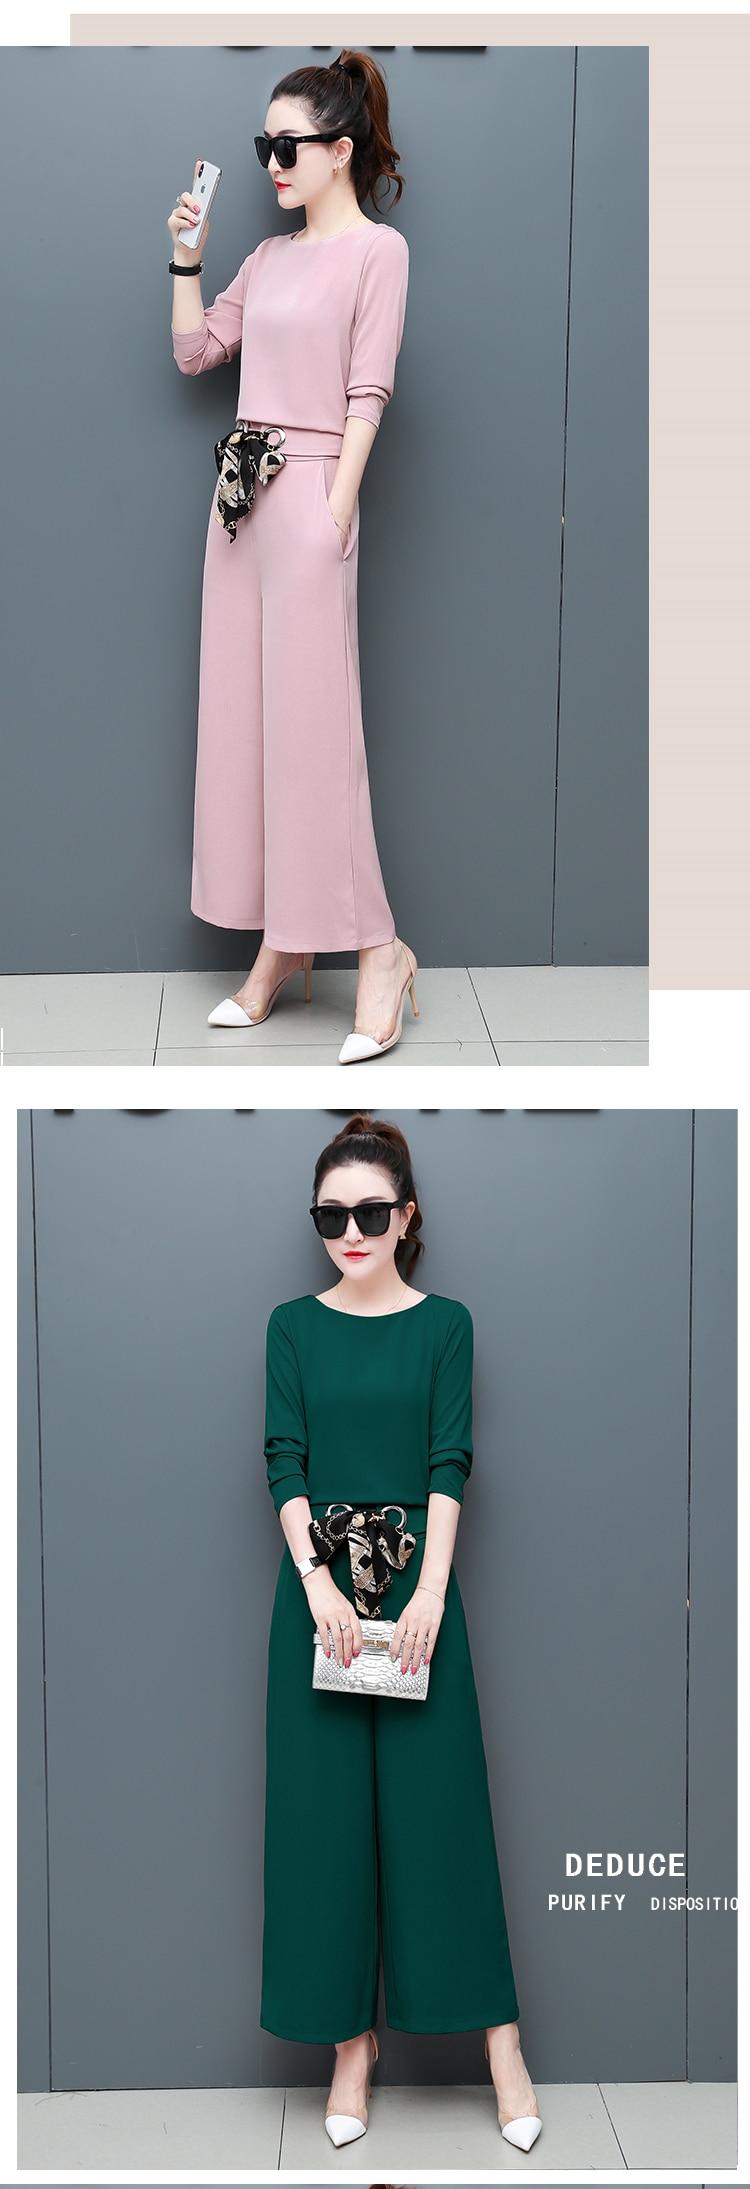 Chiffon 2 Piece Set Women Long Sleeve Tops And Wide Leg Pants Trousers Set Suits Spring Autumn Casual Office Elegant Women's Set 14